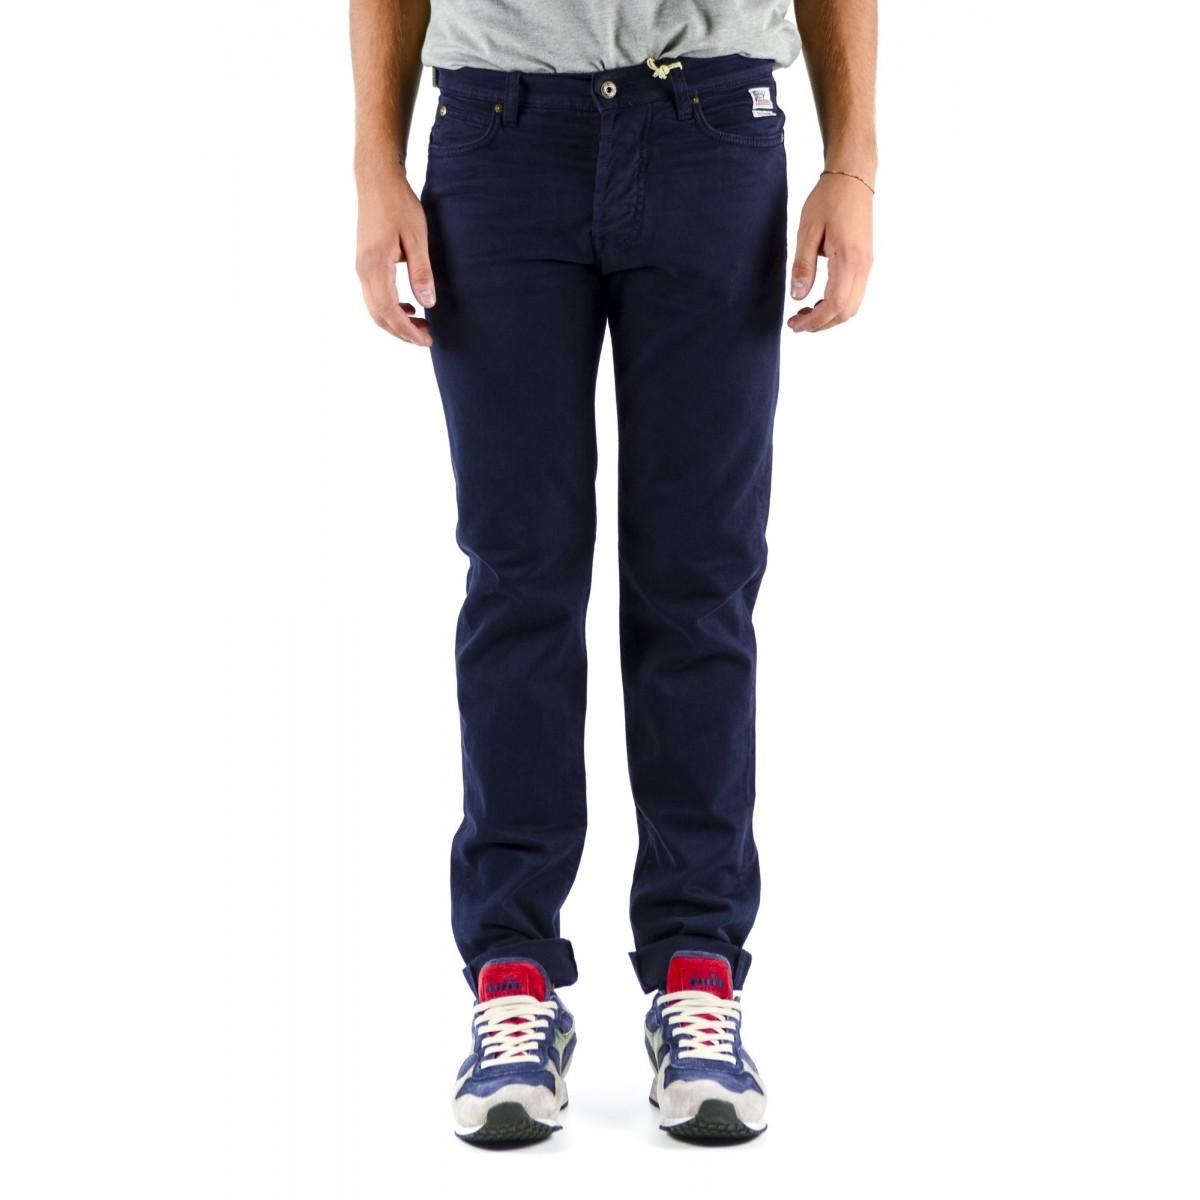 Pantalone uomo Roy rogers - Pf18 gabardina libert. winter 001 - blu